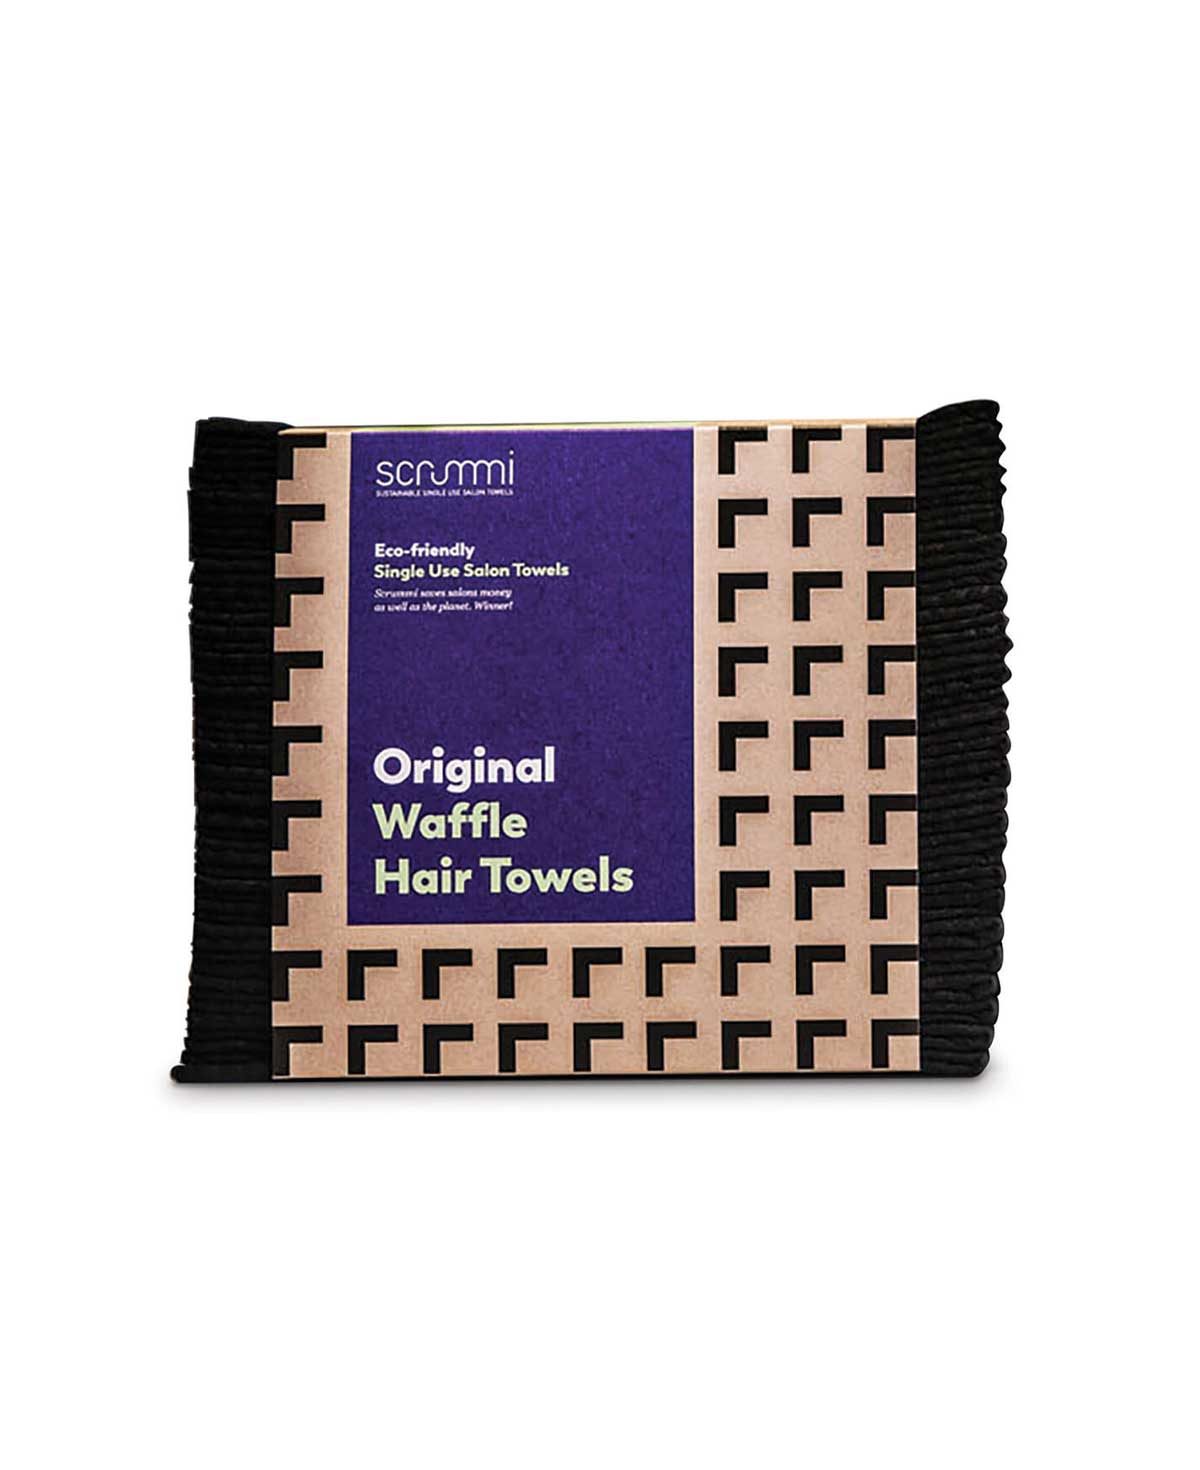 Scrummi Waffle Black Hair Towels, 80x40cm, 70 Stk.